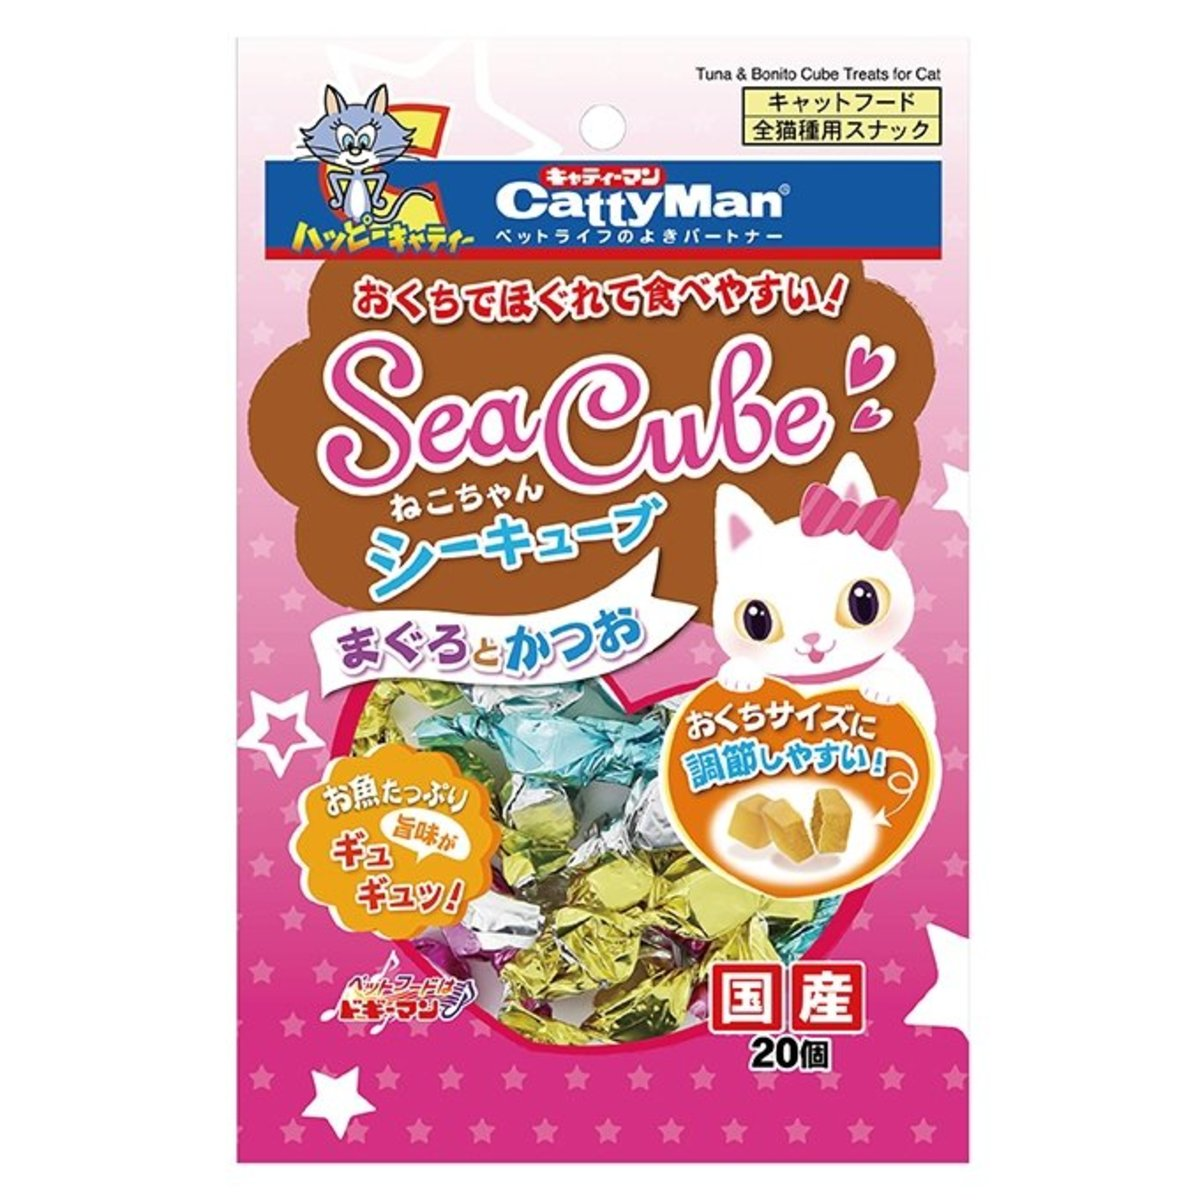 Catty Sea Cube Tuna & Bonito (20pcs) #82005 C5